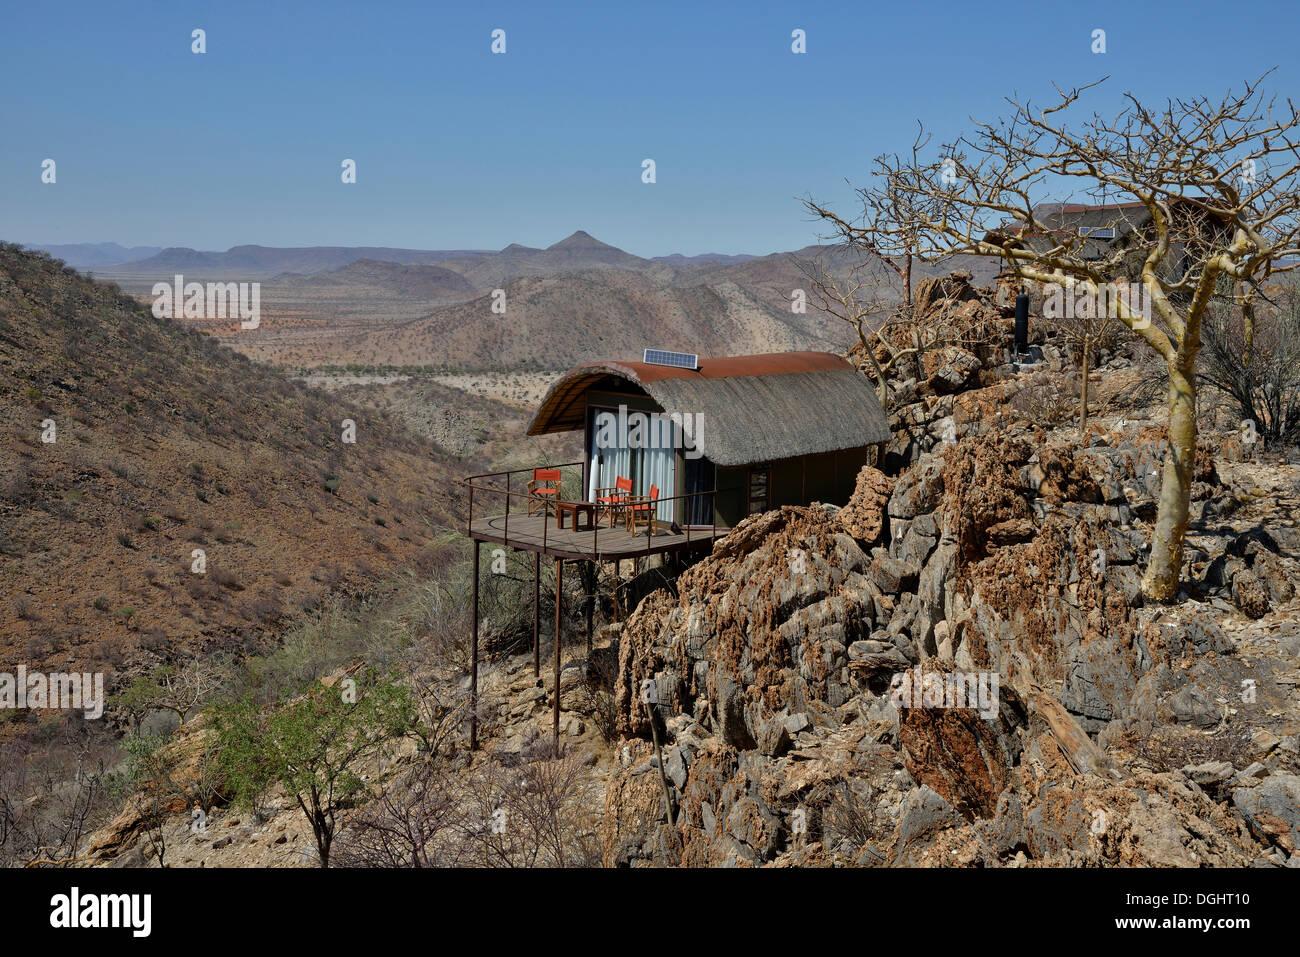 Etambura Camp, lodge run by Himba, bei Orupembe, near Orupembe, Kaokoland, Kunene, Namibia - Stock Image